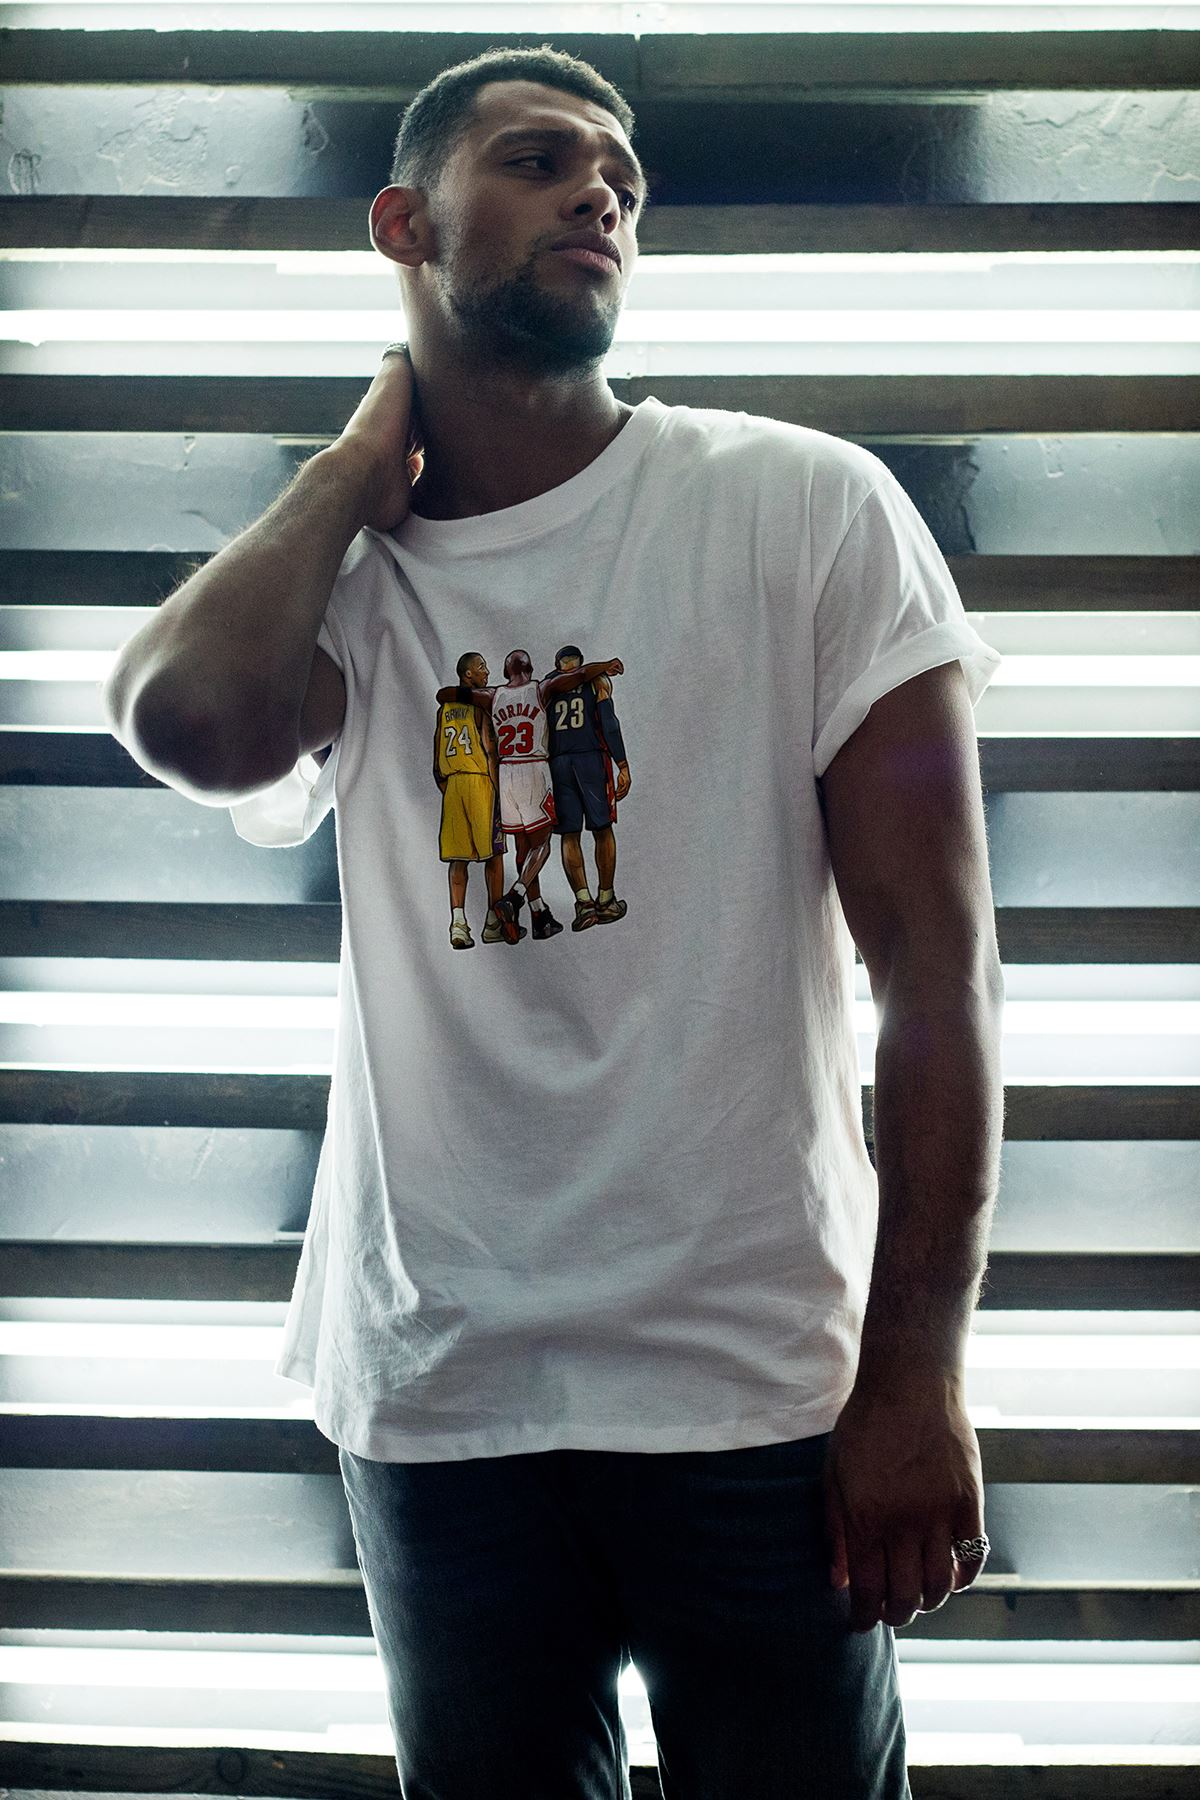 Legends 40 Beyaz Erkek Oversize Tshirt - Tişört